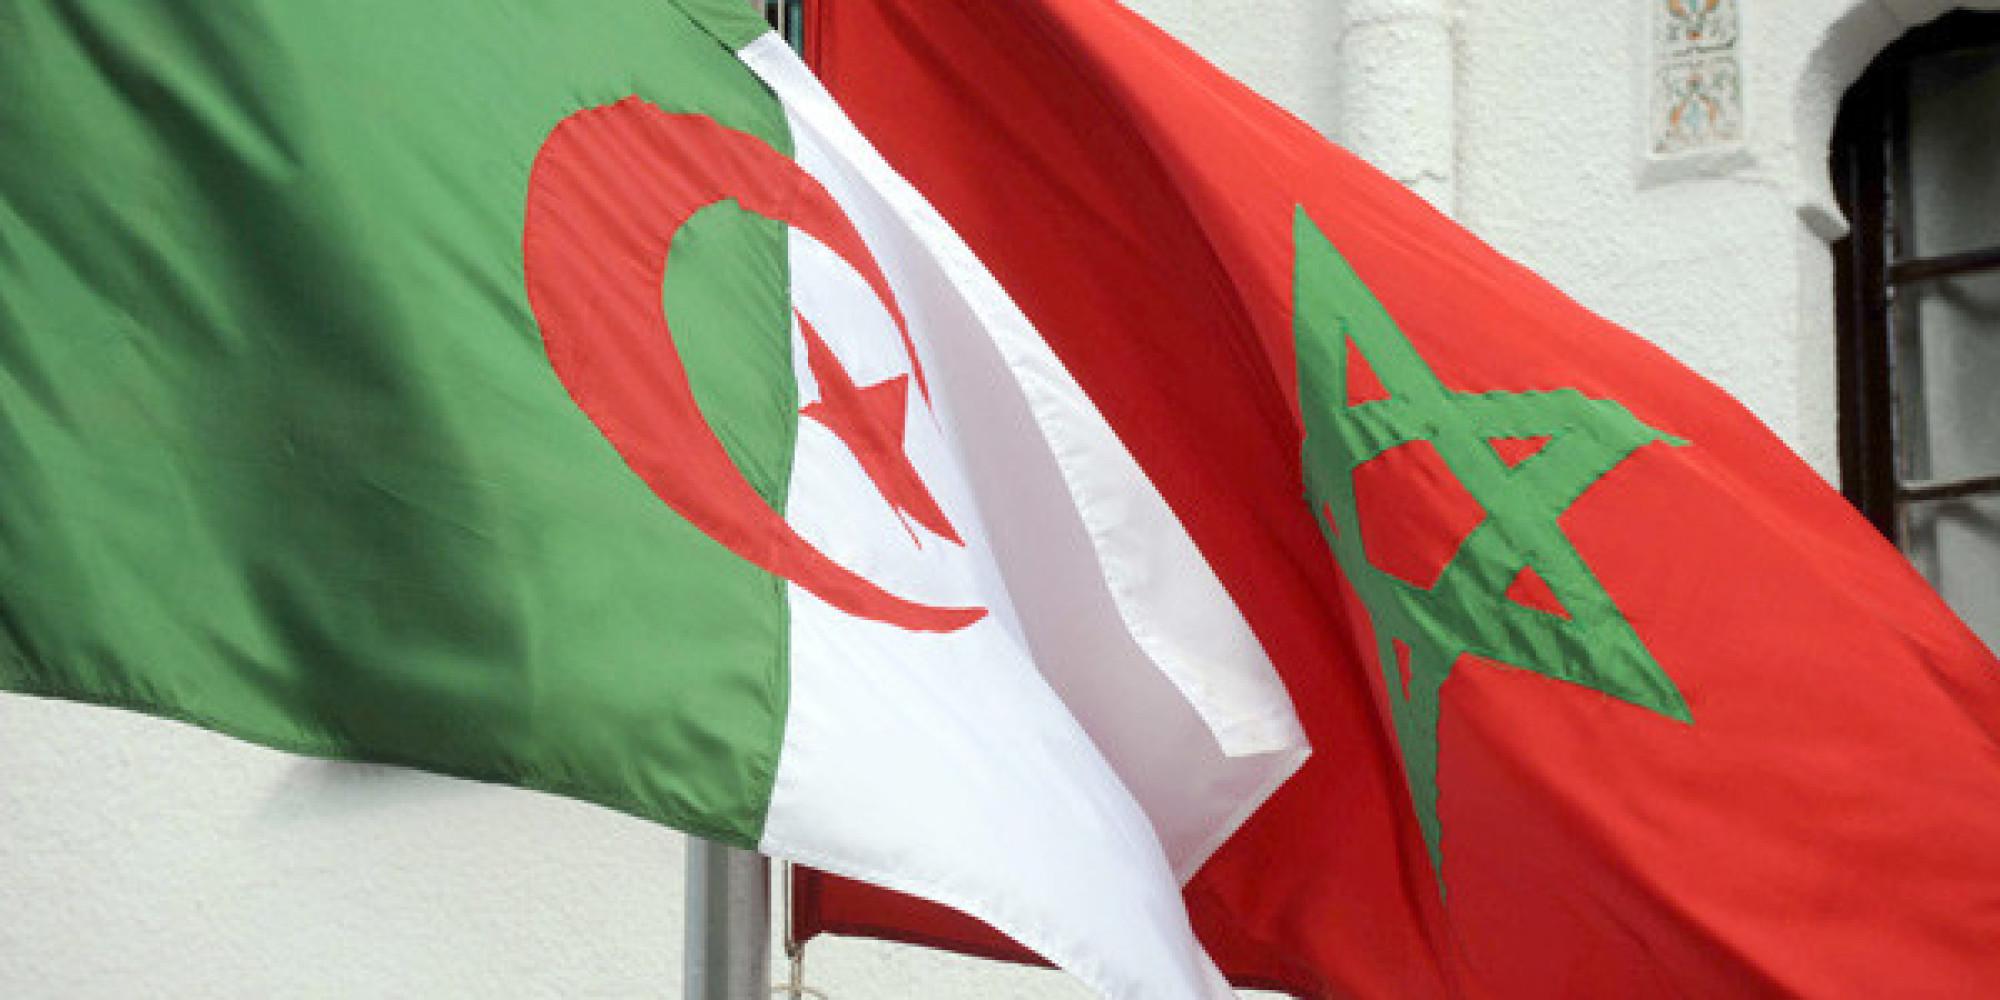 Historique rencontre algerie tunisie